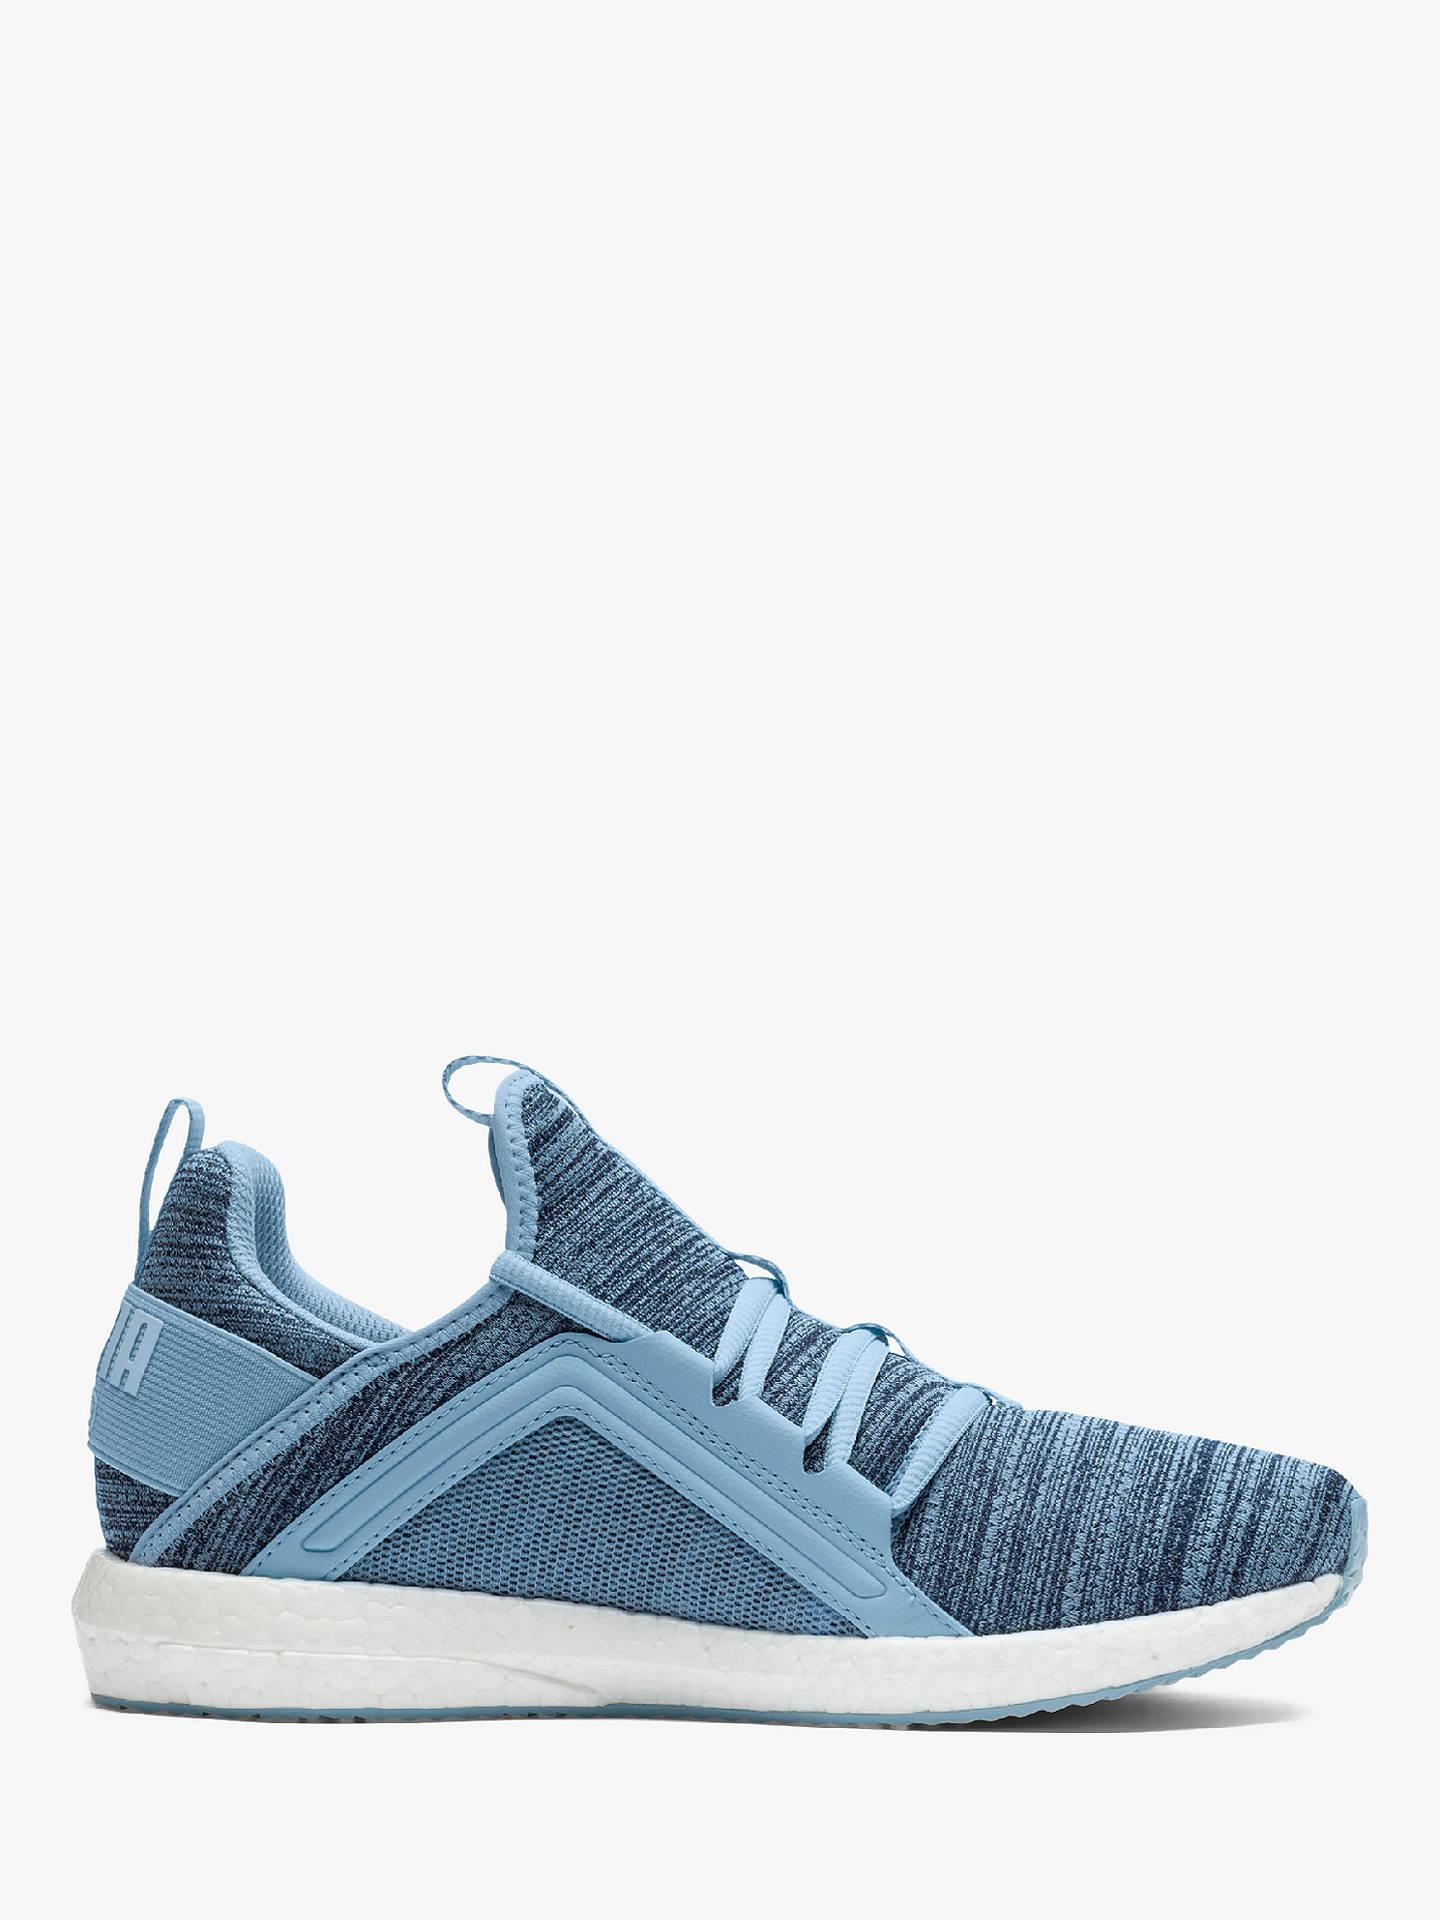 900071fb8b427 Buy PUMA Ignite Flash evoKNIT Women s Running Shoes